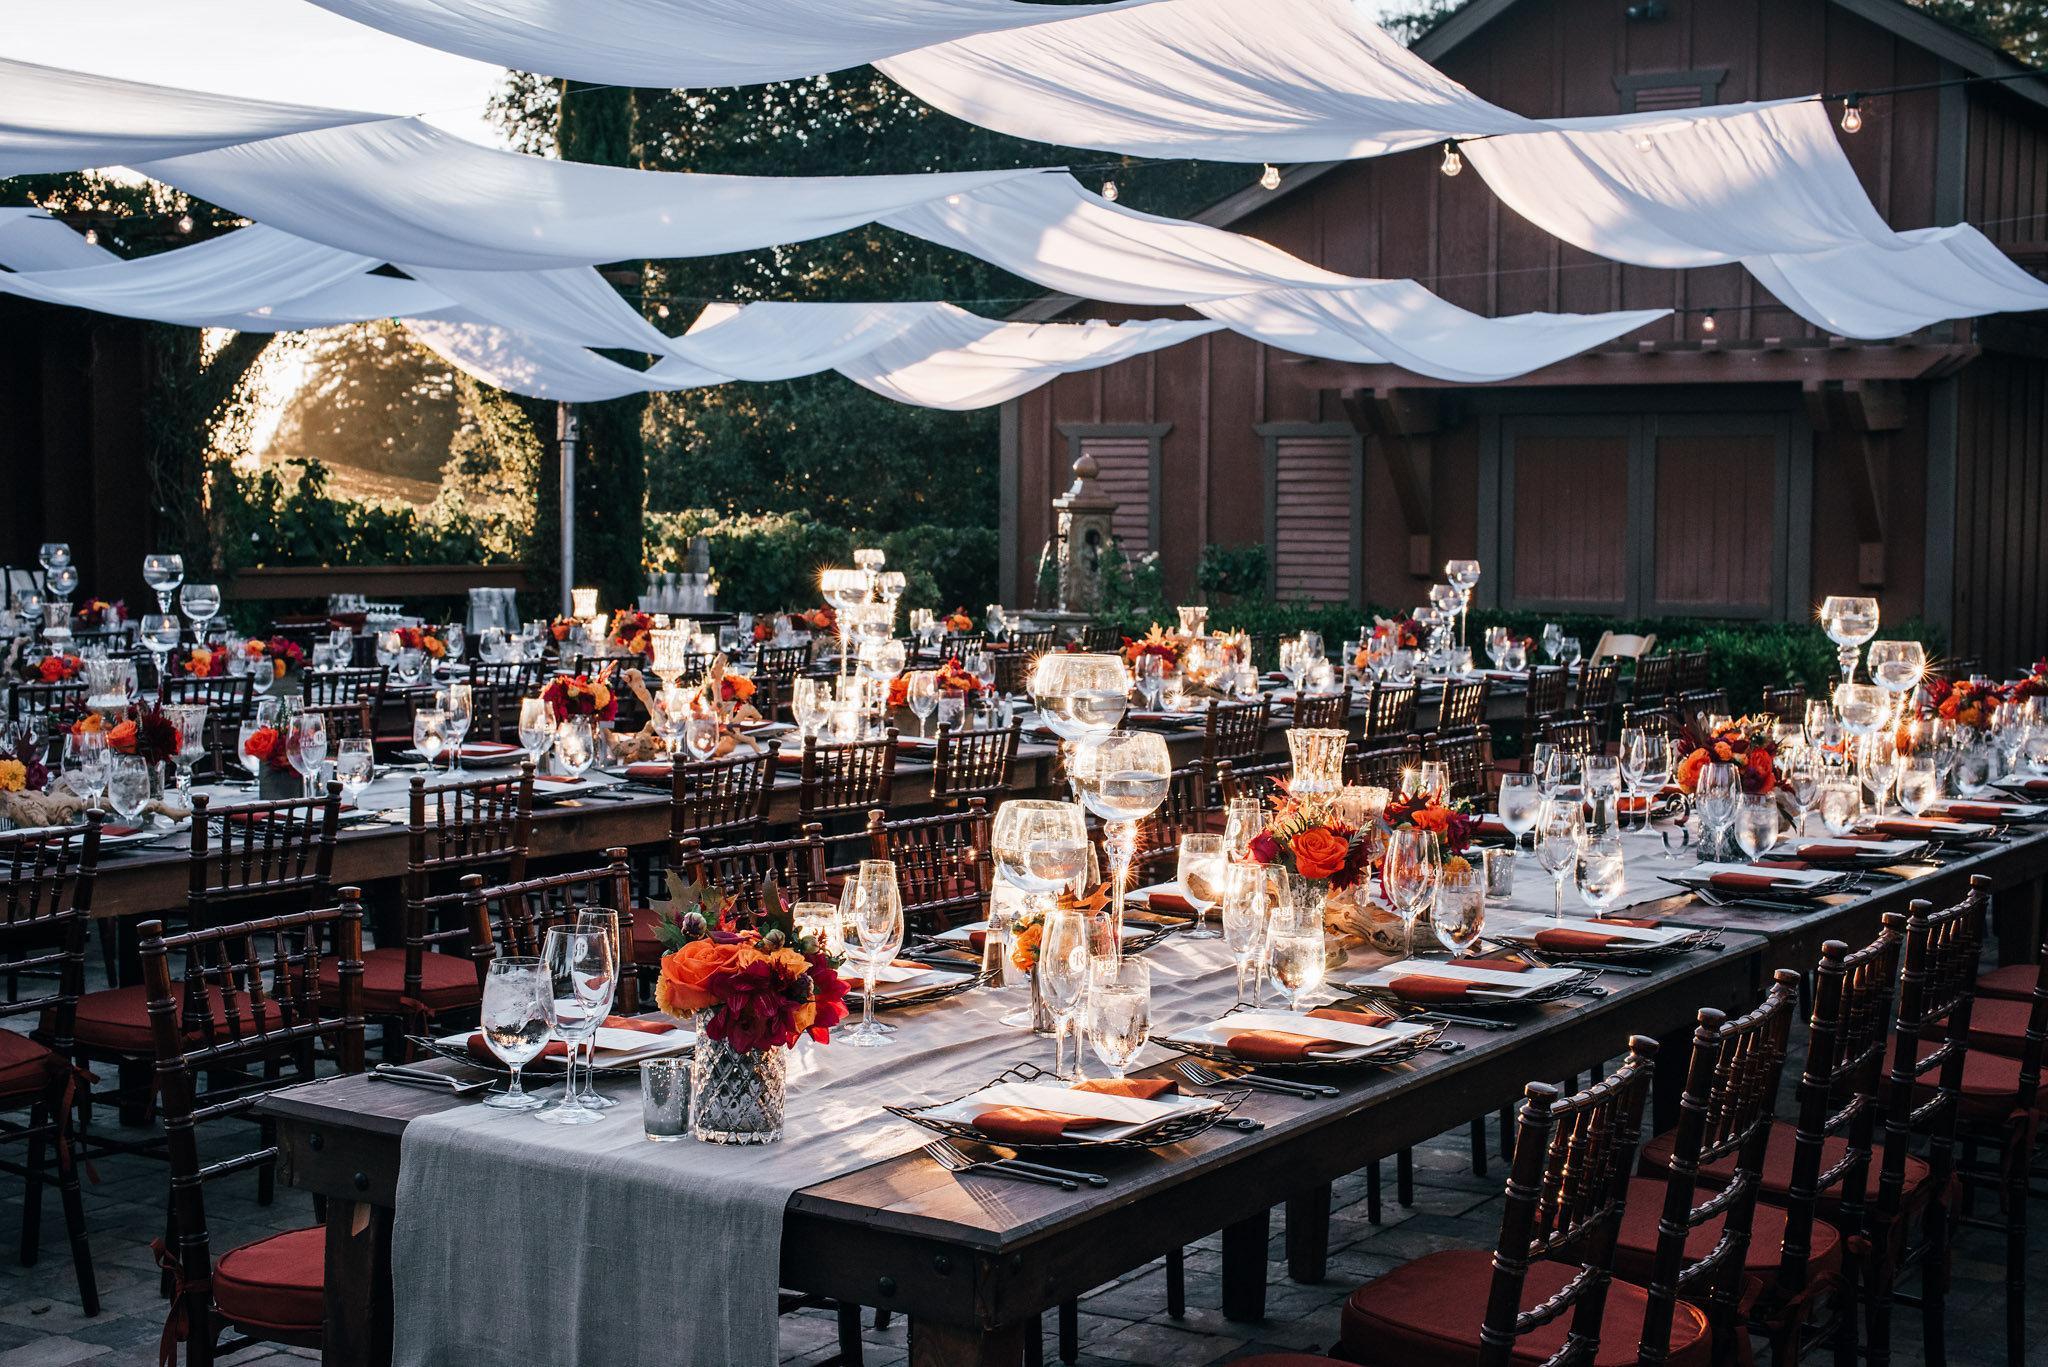 Autumn Wedding at Regale Winery - Amazae Events